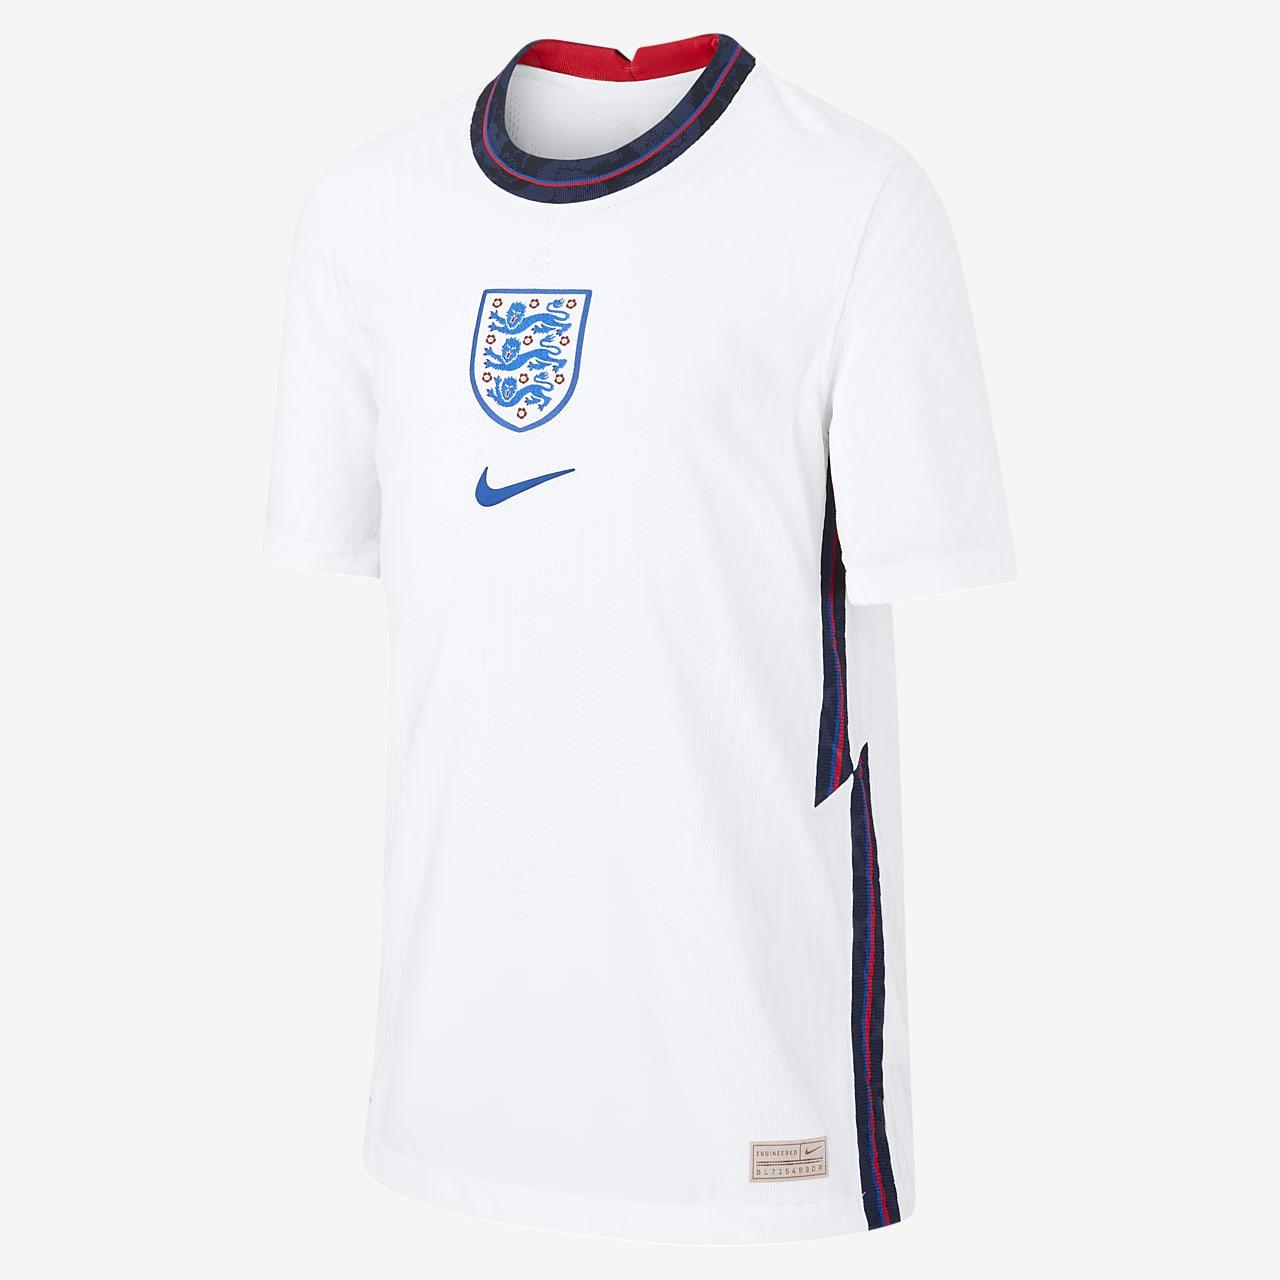 Anglia 2020 Vapor Match hazai futballmez nagyobb gyerekeknek